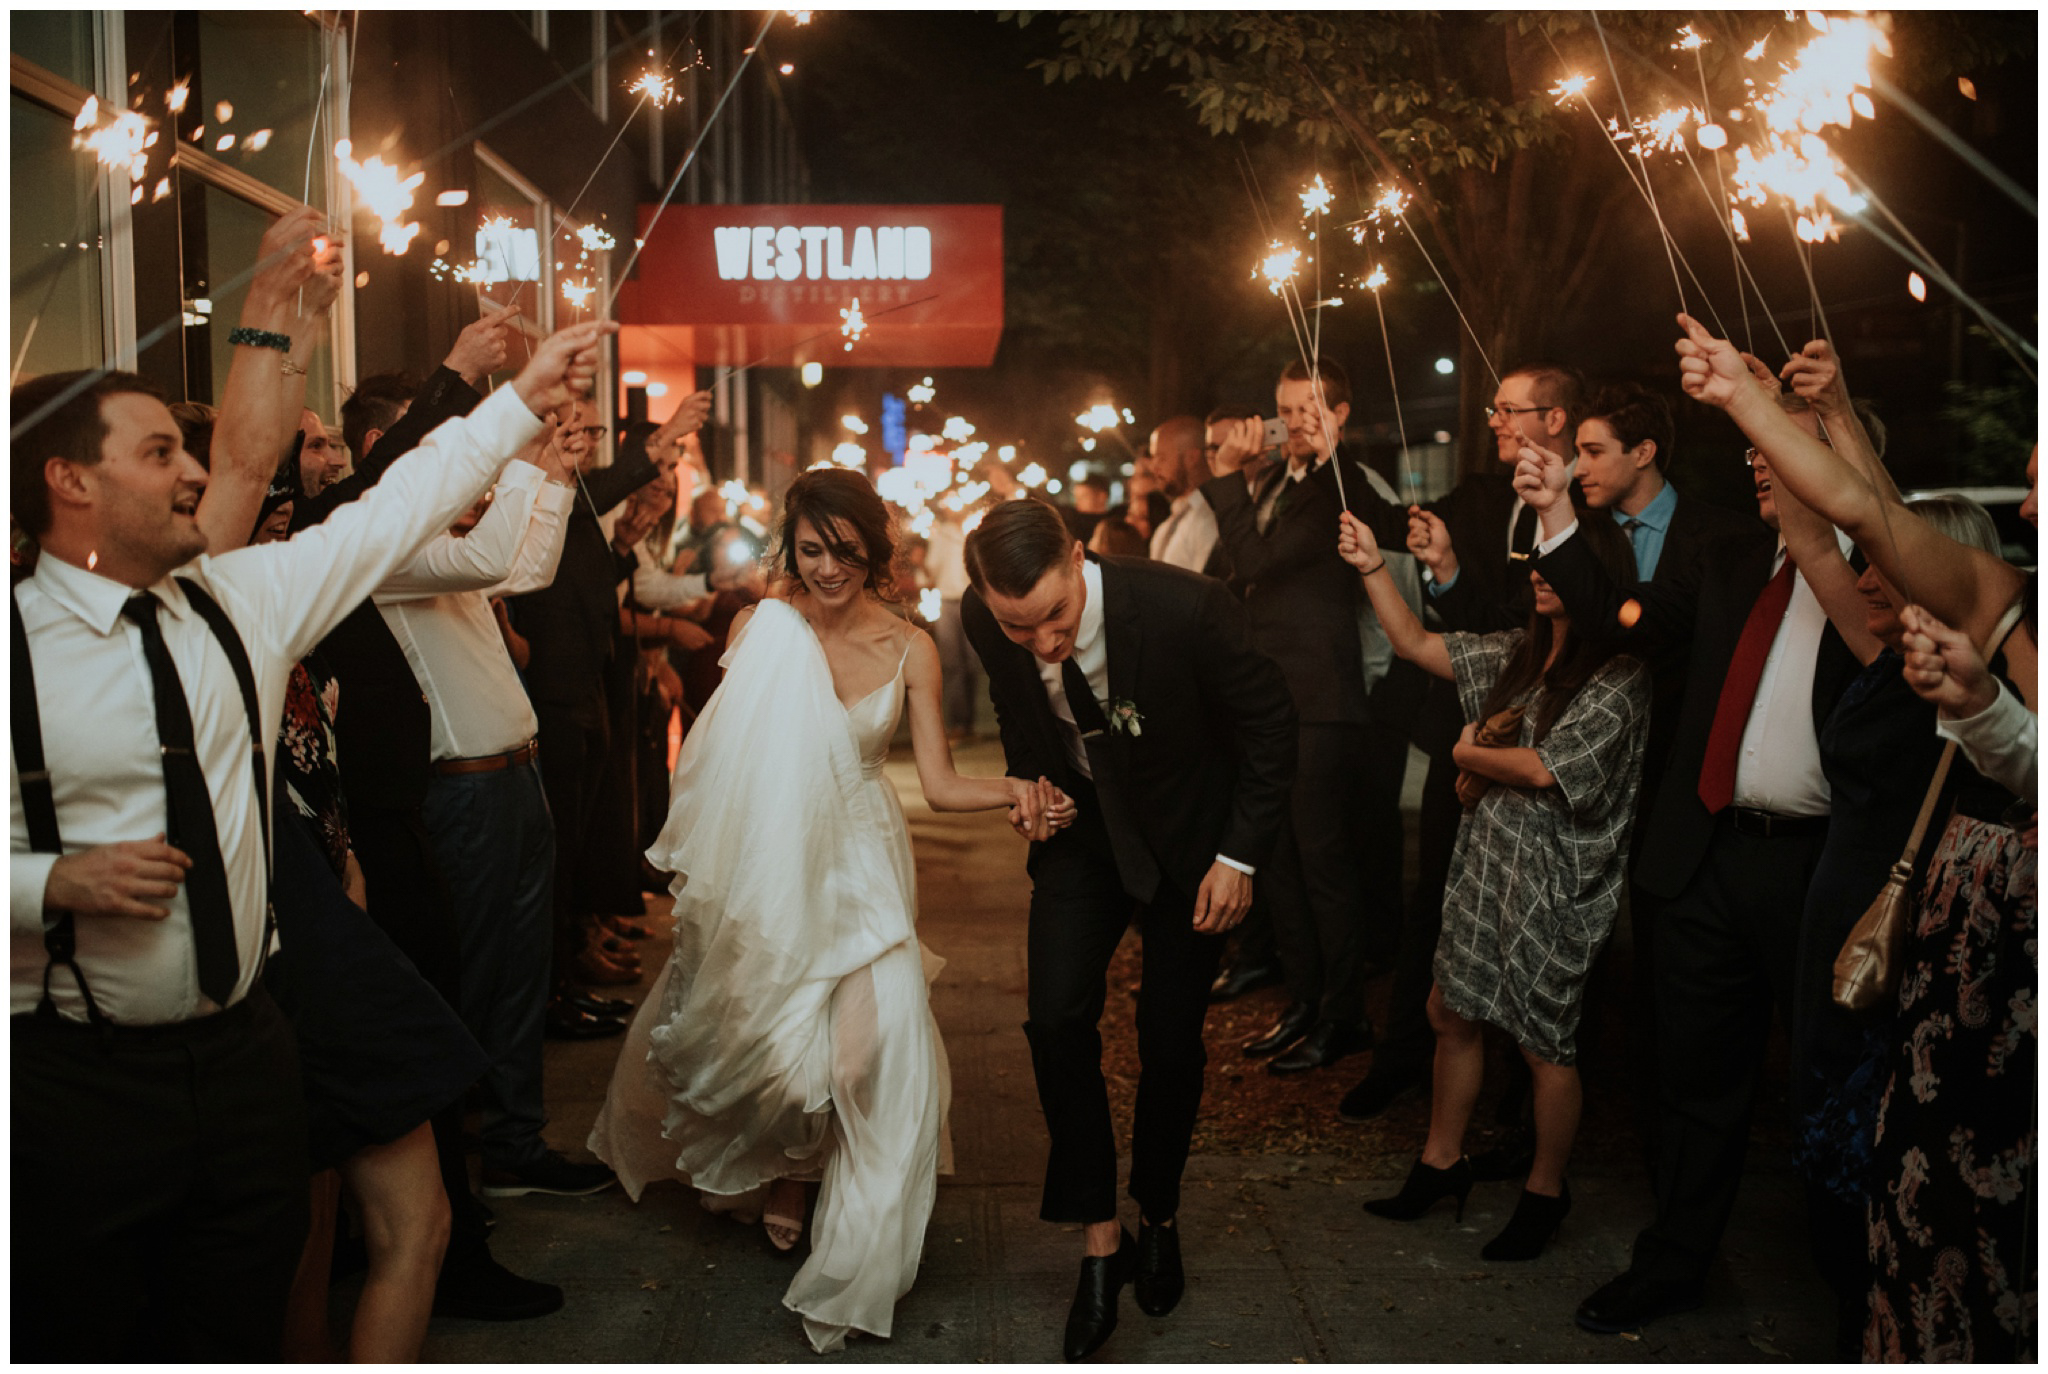 alyssa-keiran-westland-distillery-urban-seattle-wedding-photographer-caitlyn-nikula-176.jpg